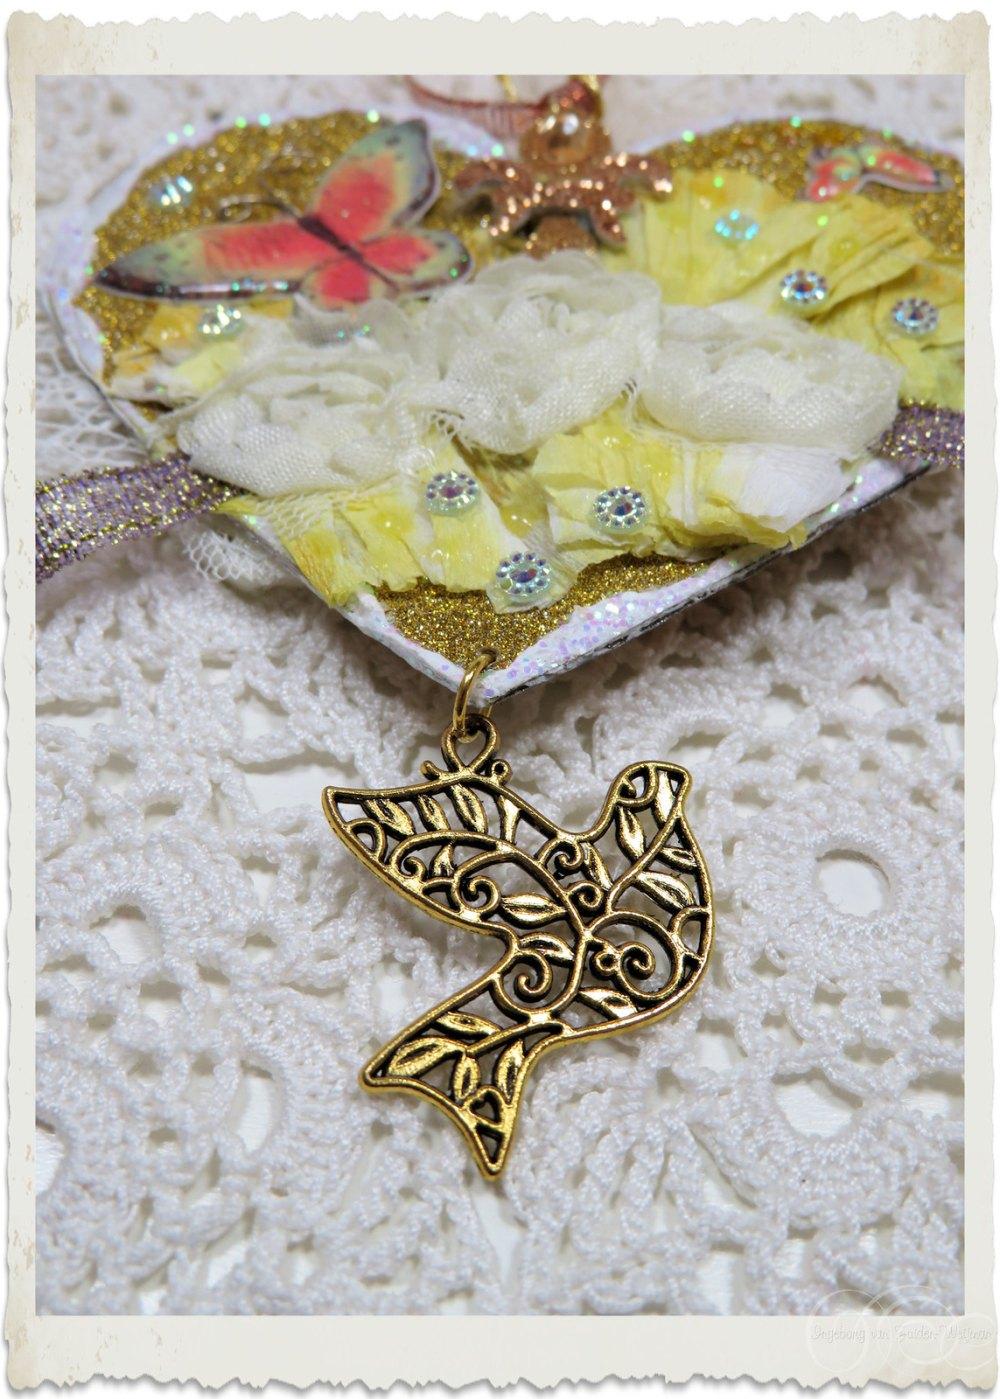 Pretty gold dove charm on handmade art project